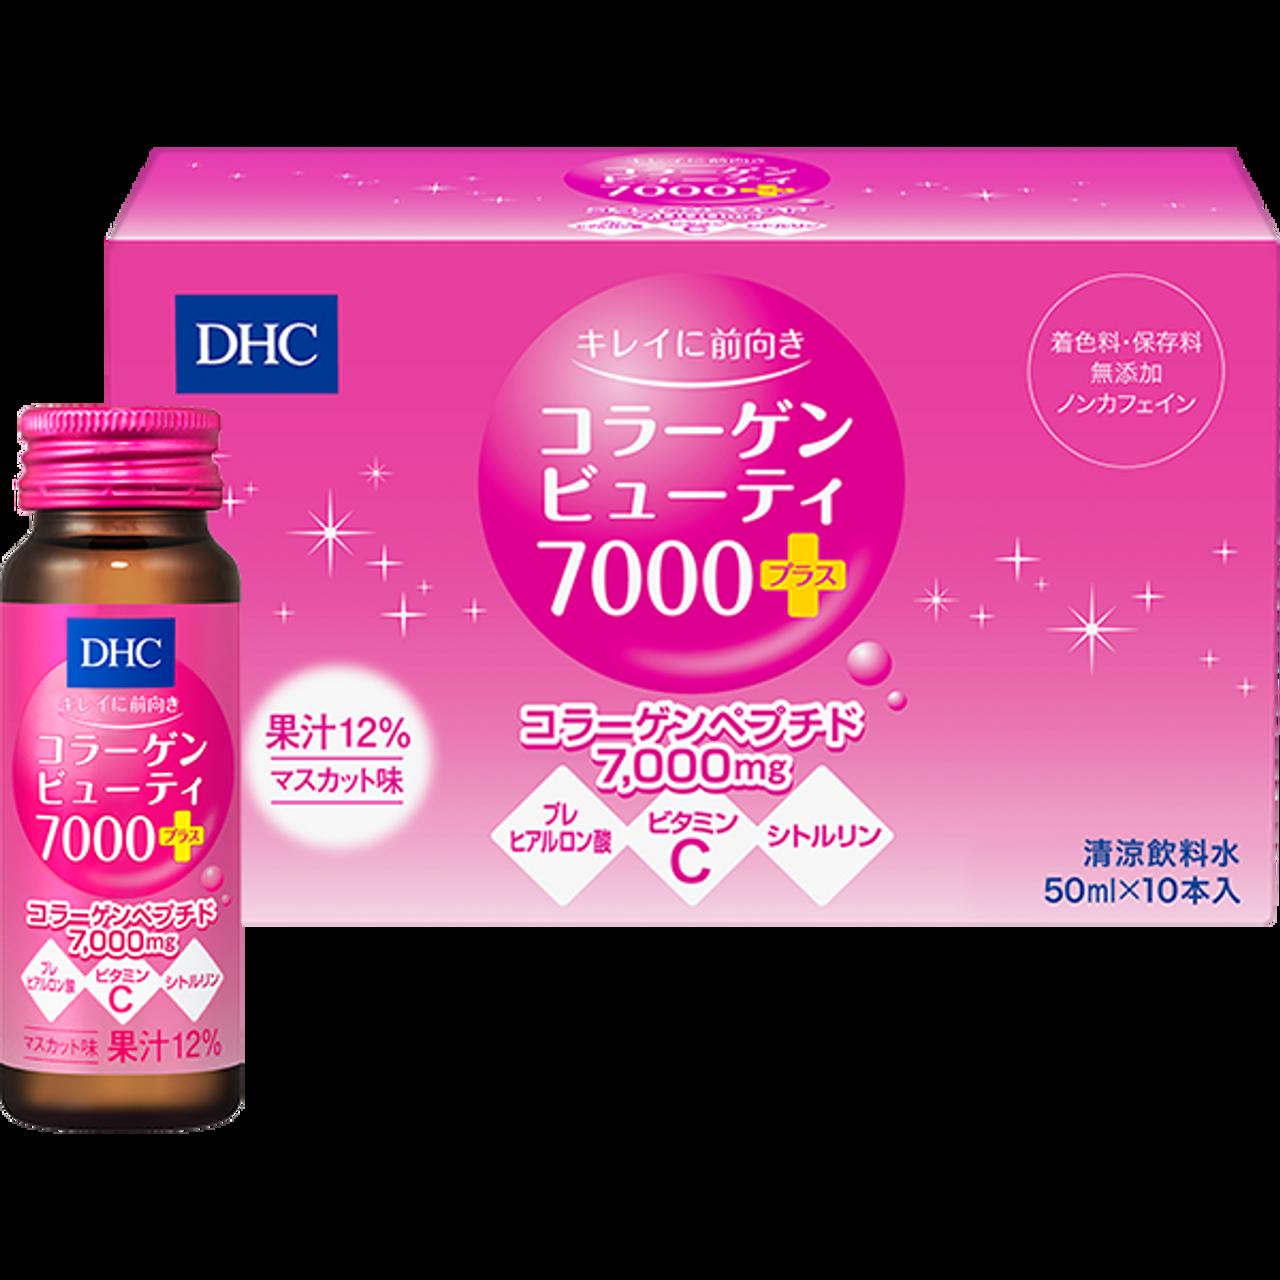 DHC Collagen Beauty 7000 Plus Коллагеновый напиток